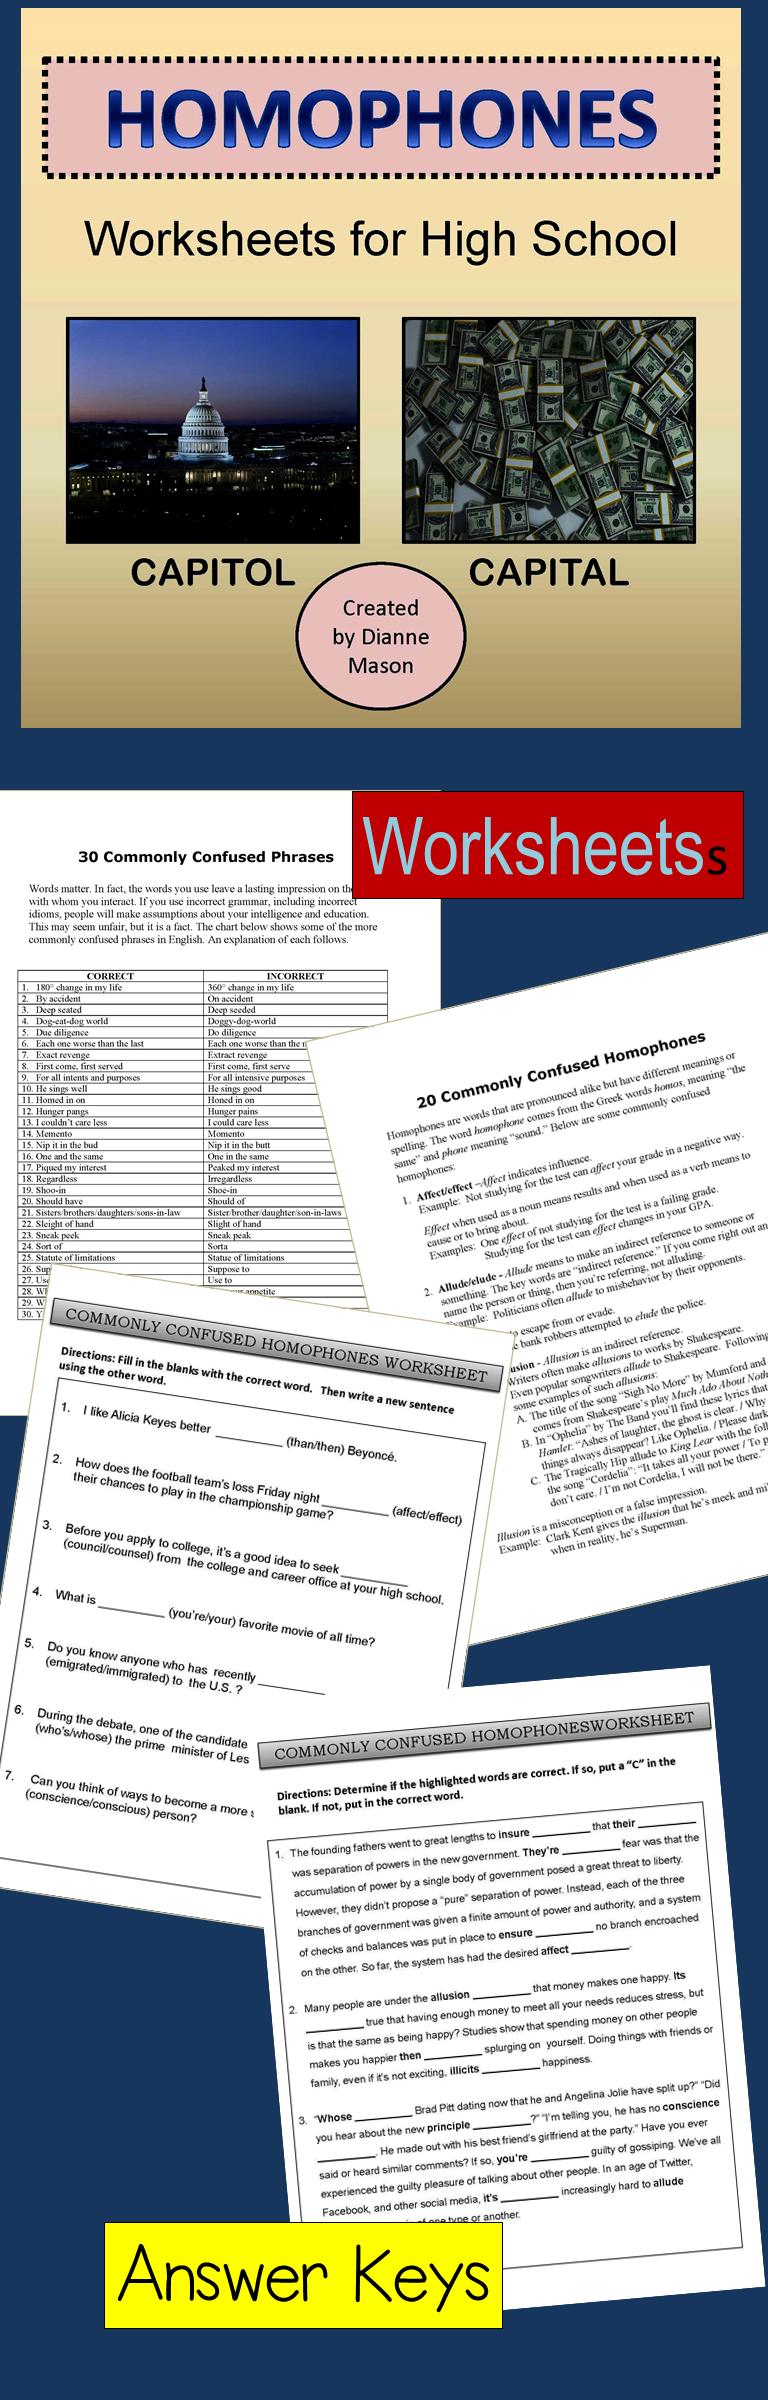 Homophones Worksheets For High School High School English Teaching Resources English Teacher Resources [ 2400 x 768 Pixel ]